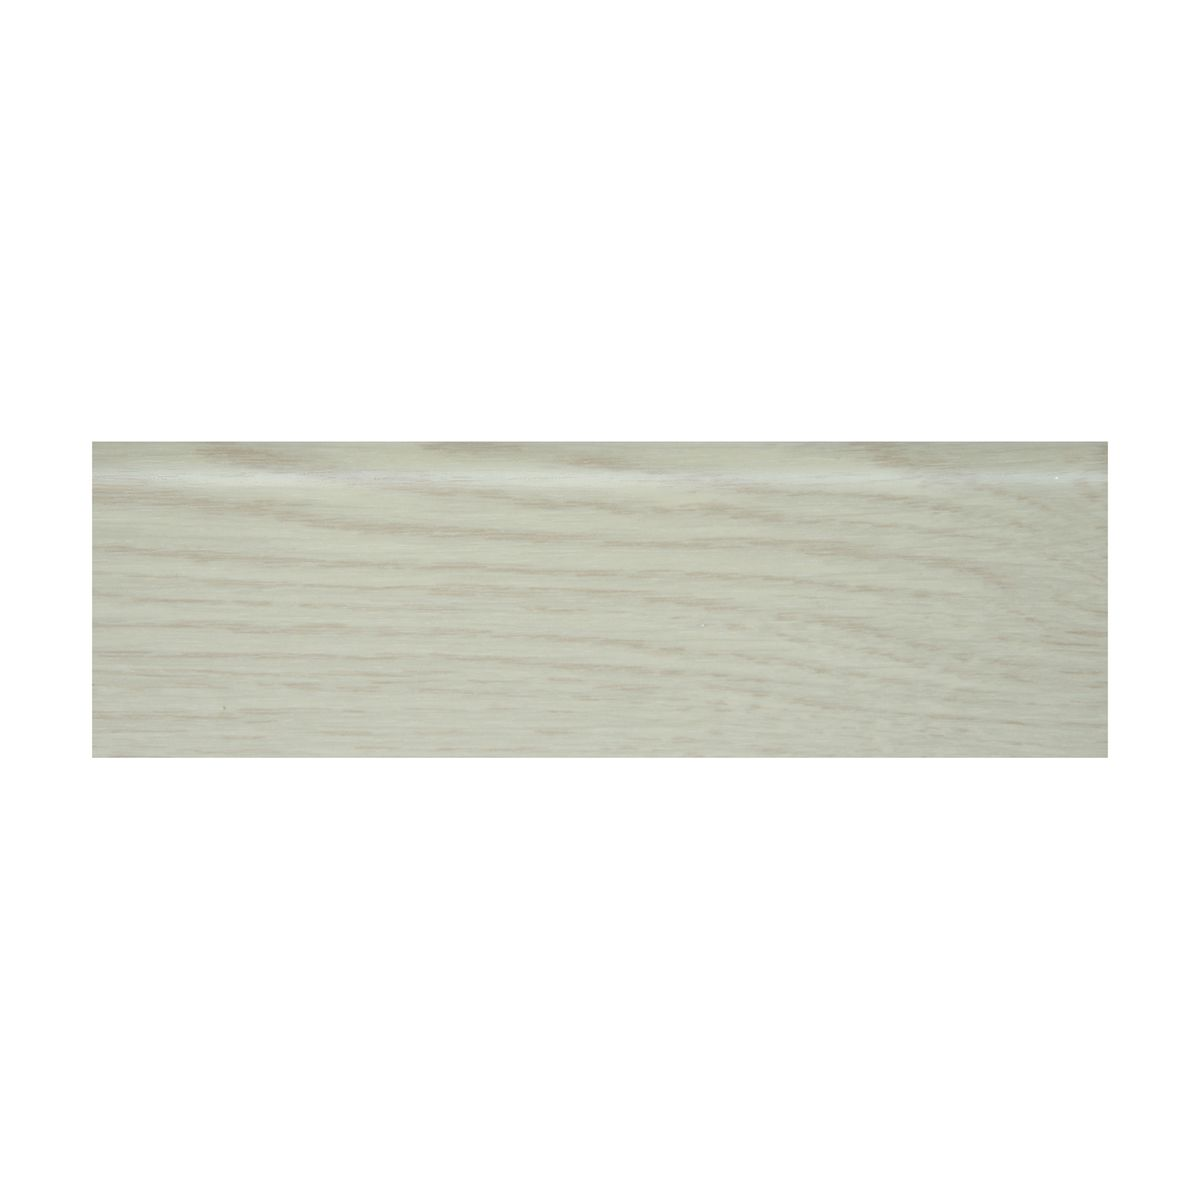 Vinilici per pareti pavimenti vinilici lvt alternative for Battiscopa leroy merlin